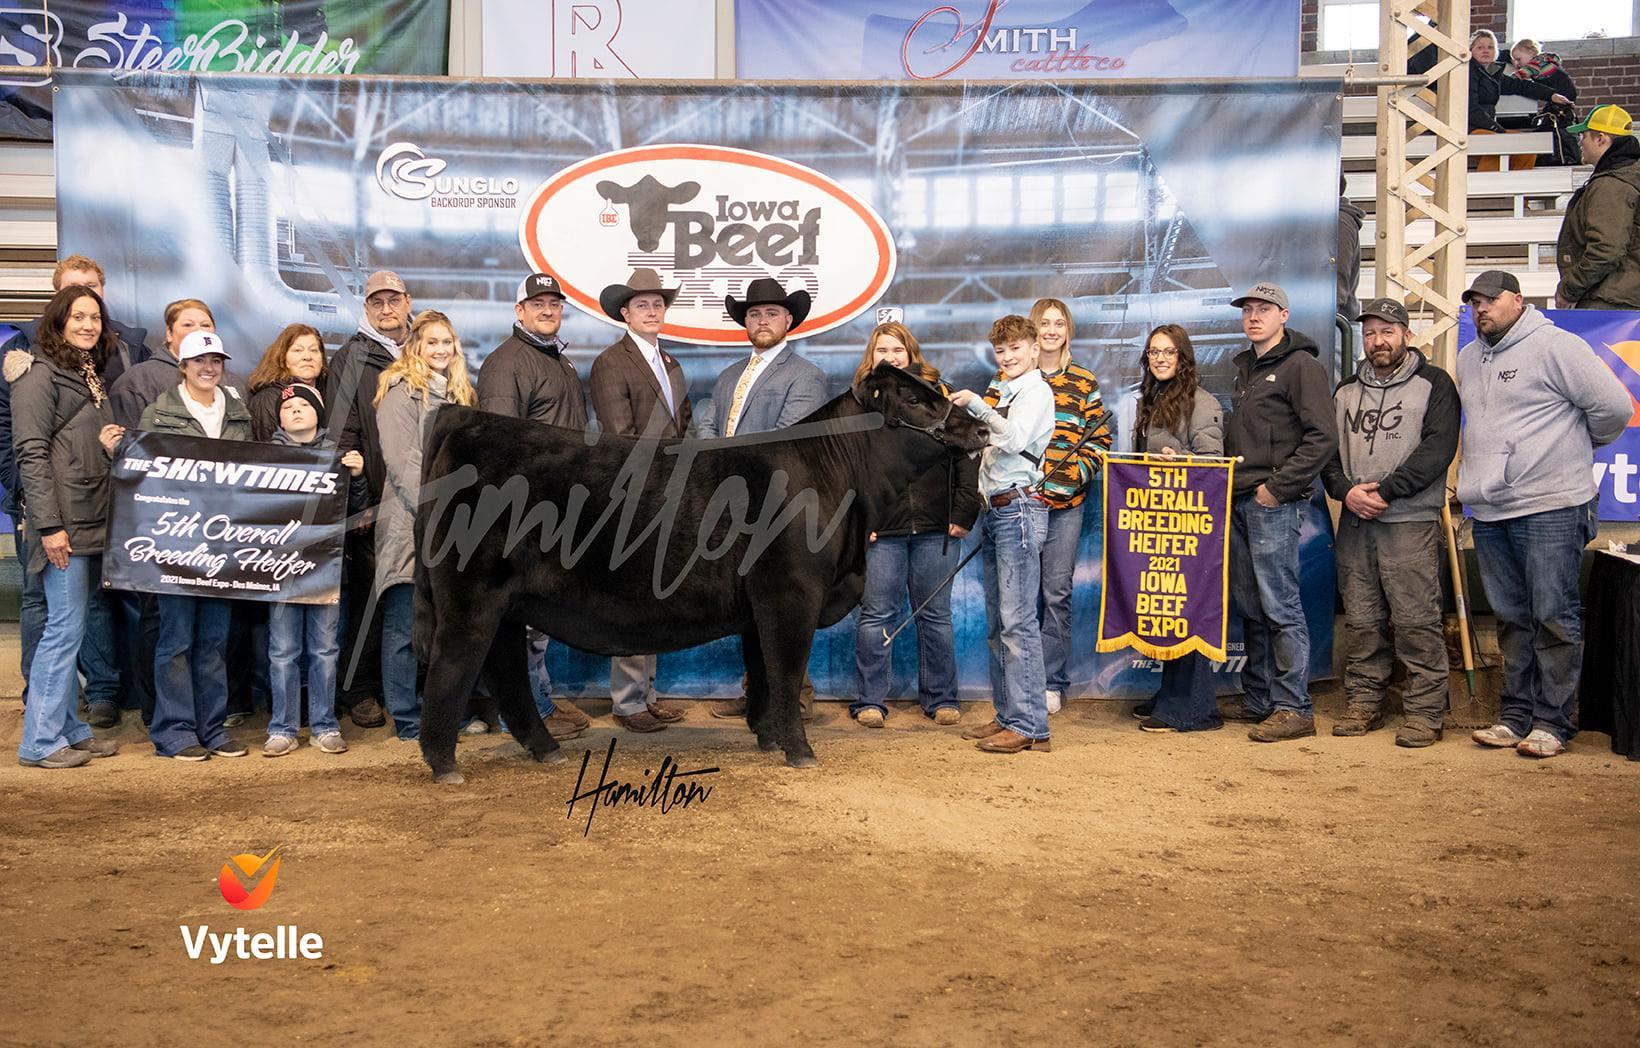 5th Overall Breeding Heifer